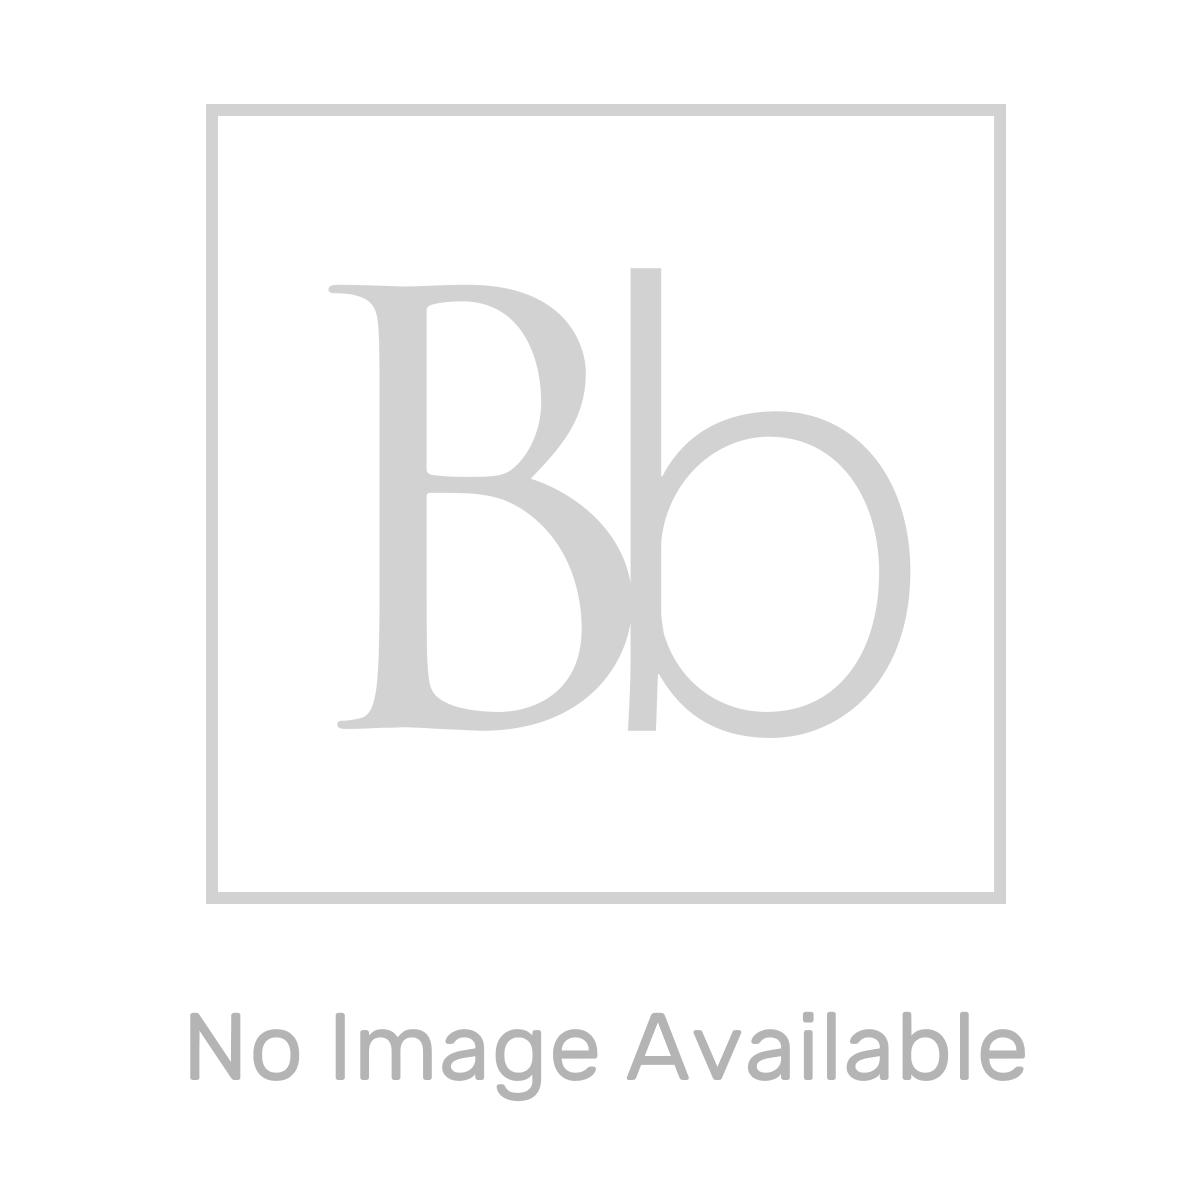 RAK Washington Grey Vanity Unit with Black Countertop 800mm